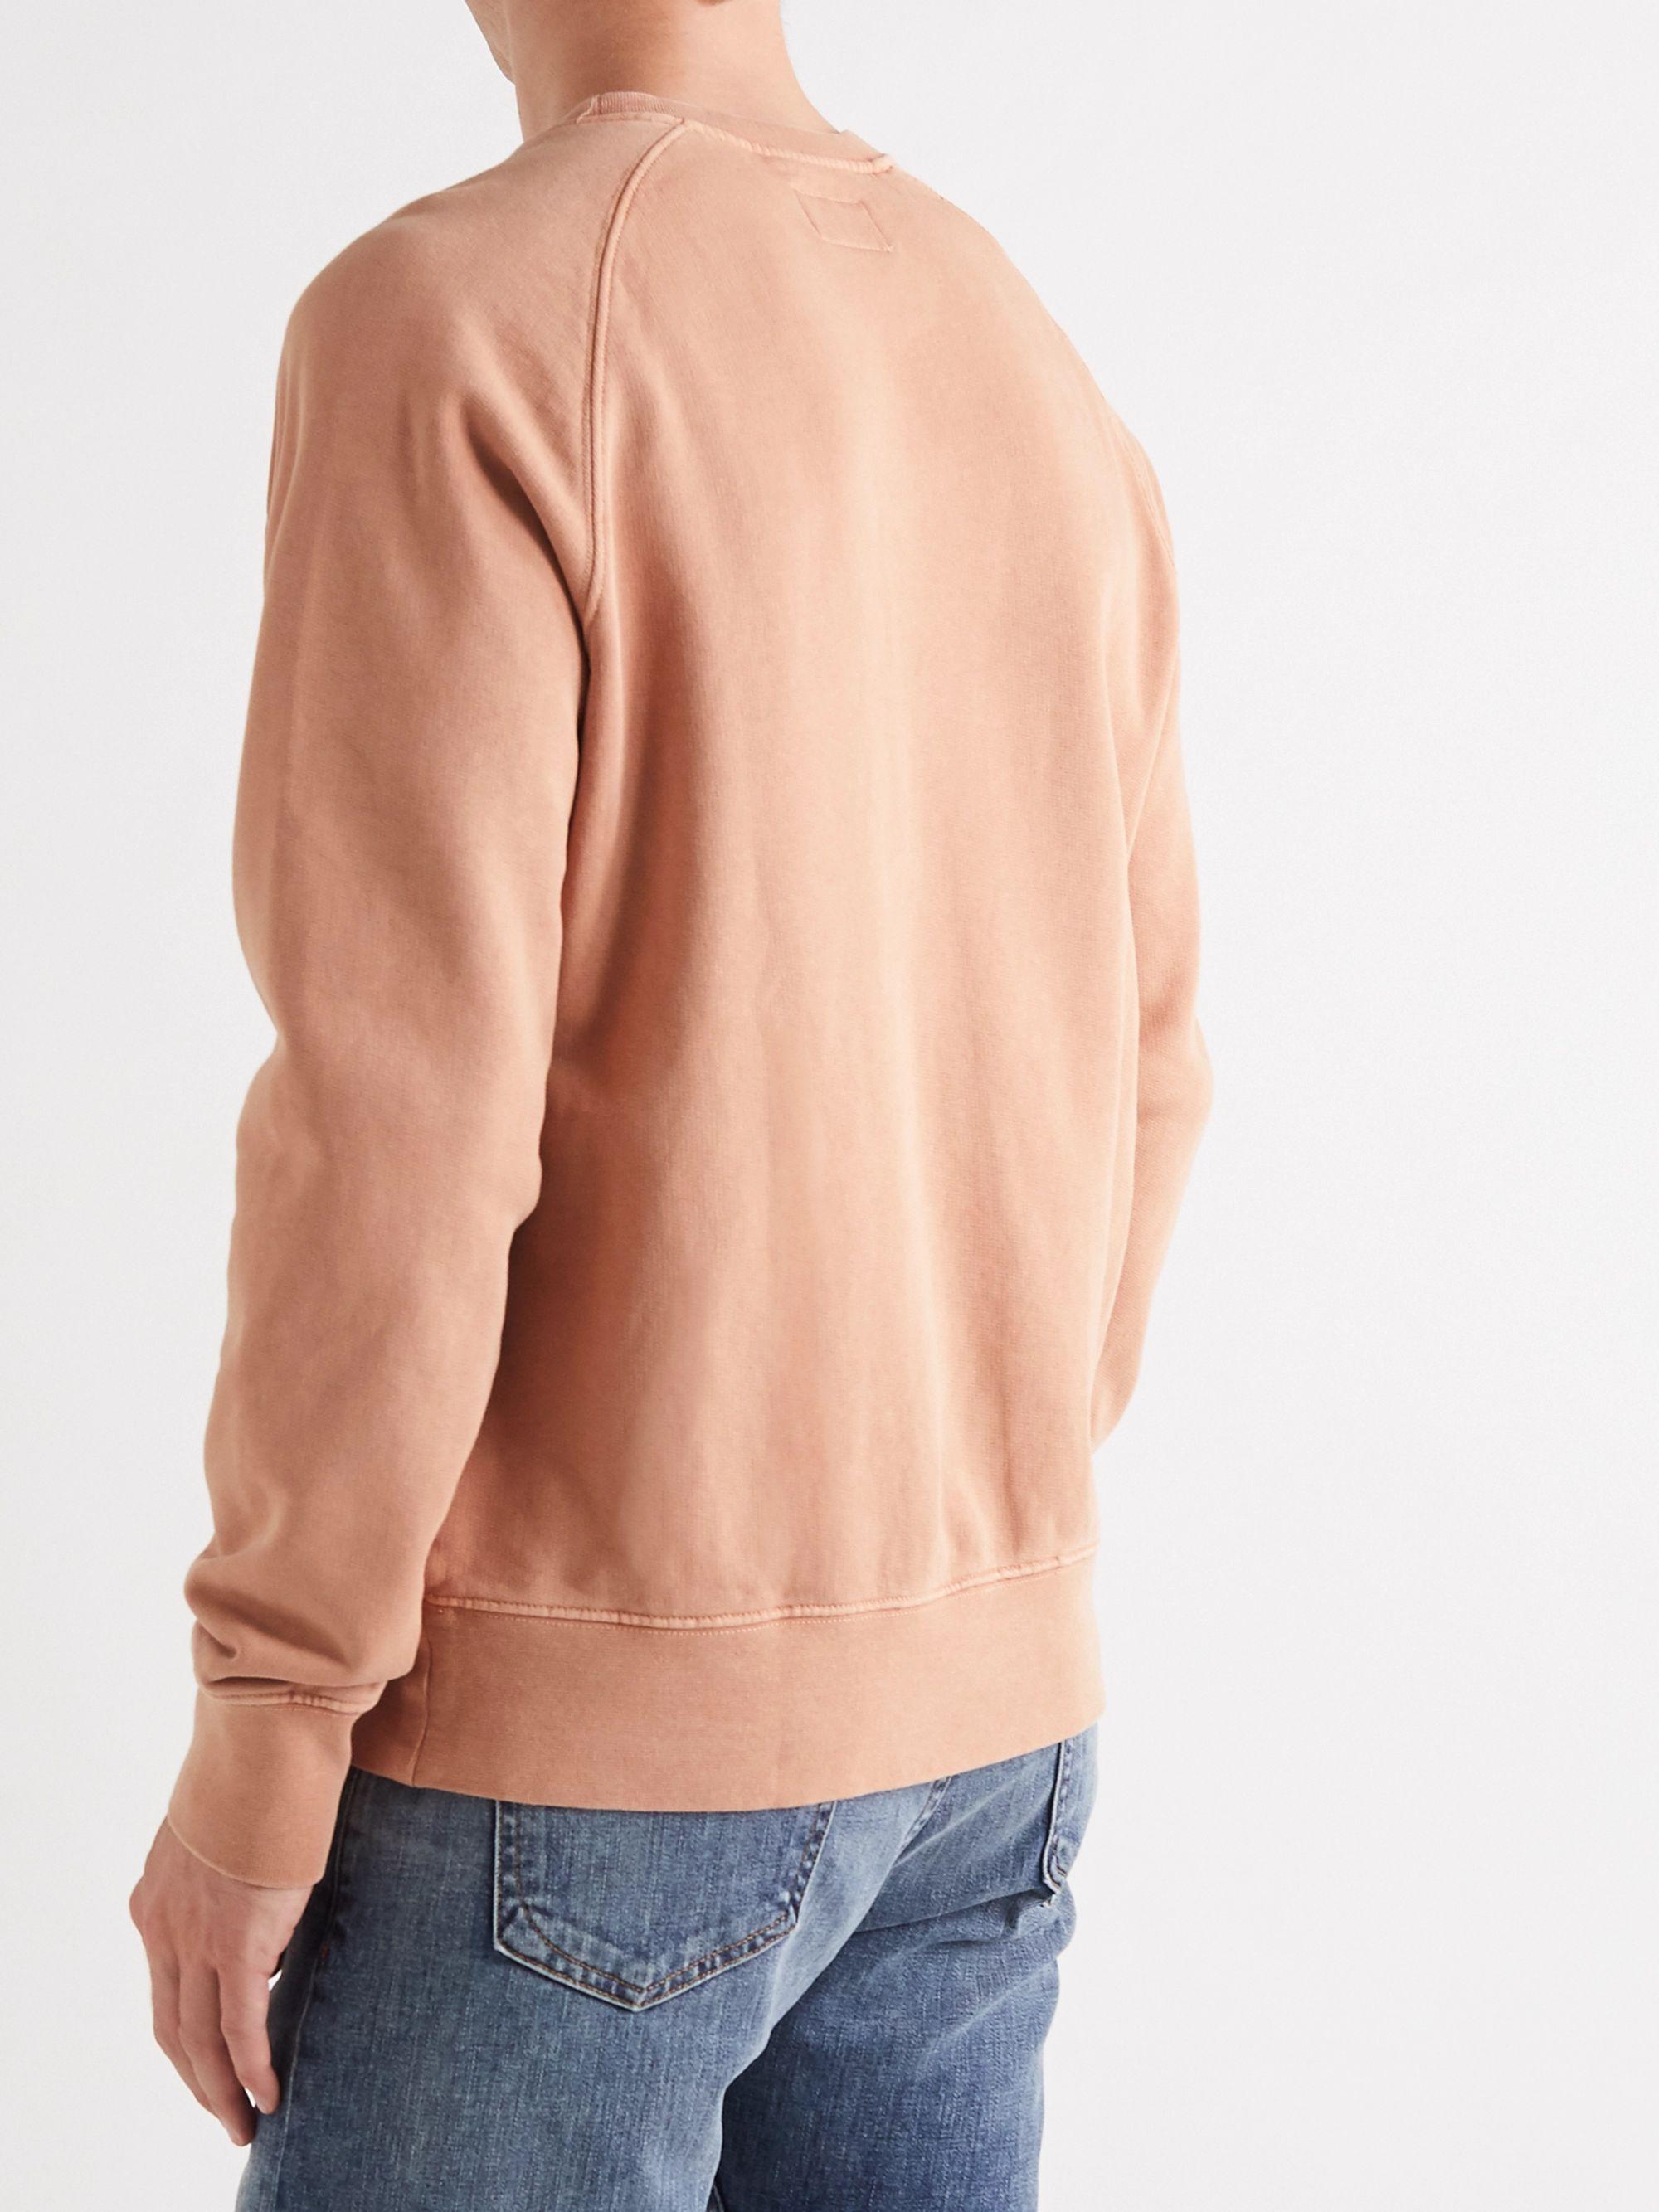 Antique Rose Melvin Logo-appliquéd Loopback Cotton-jersey Sweatshirt | Nudie Jeans